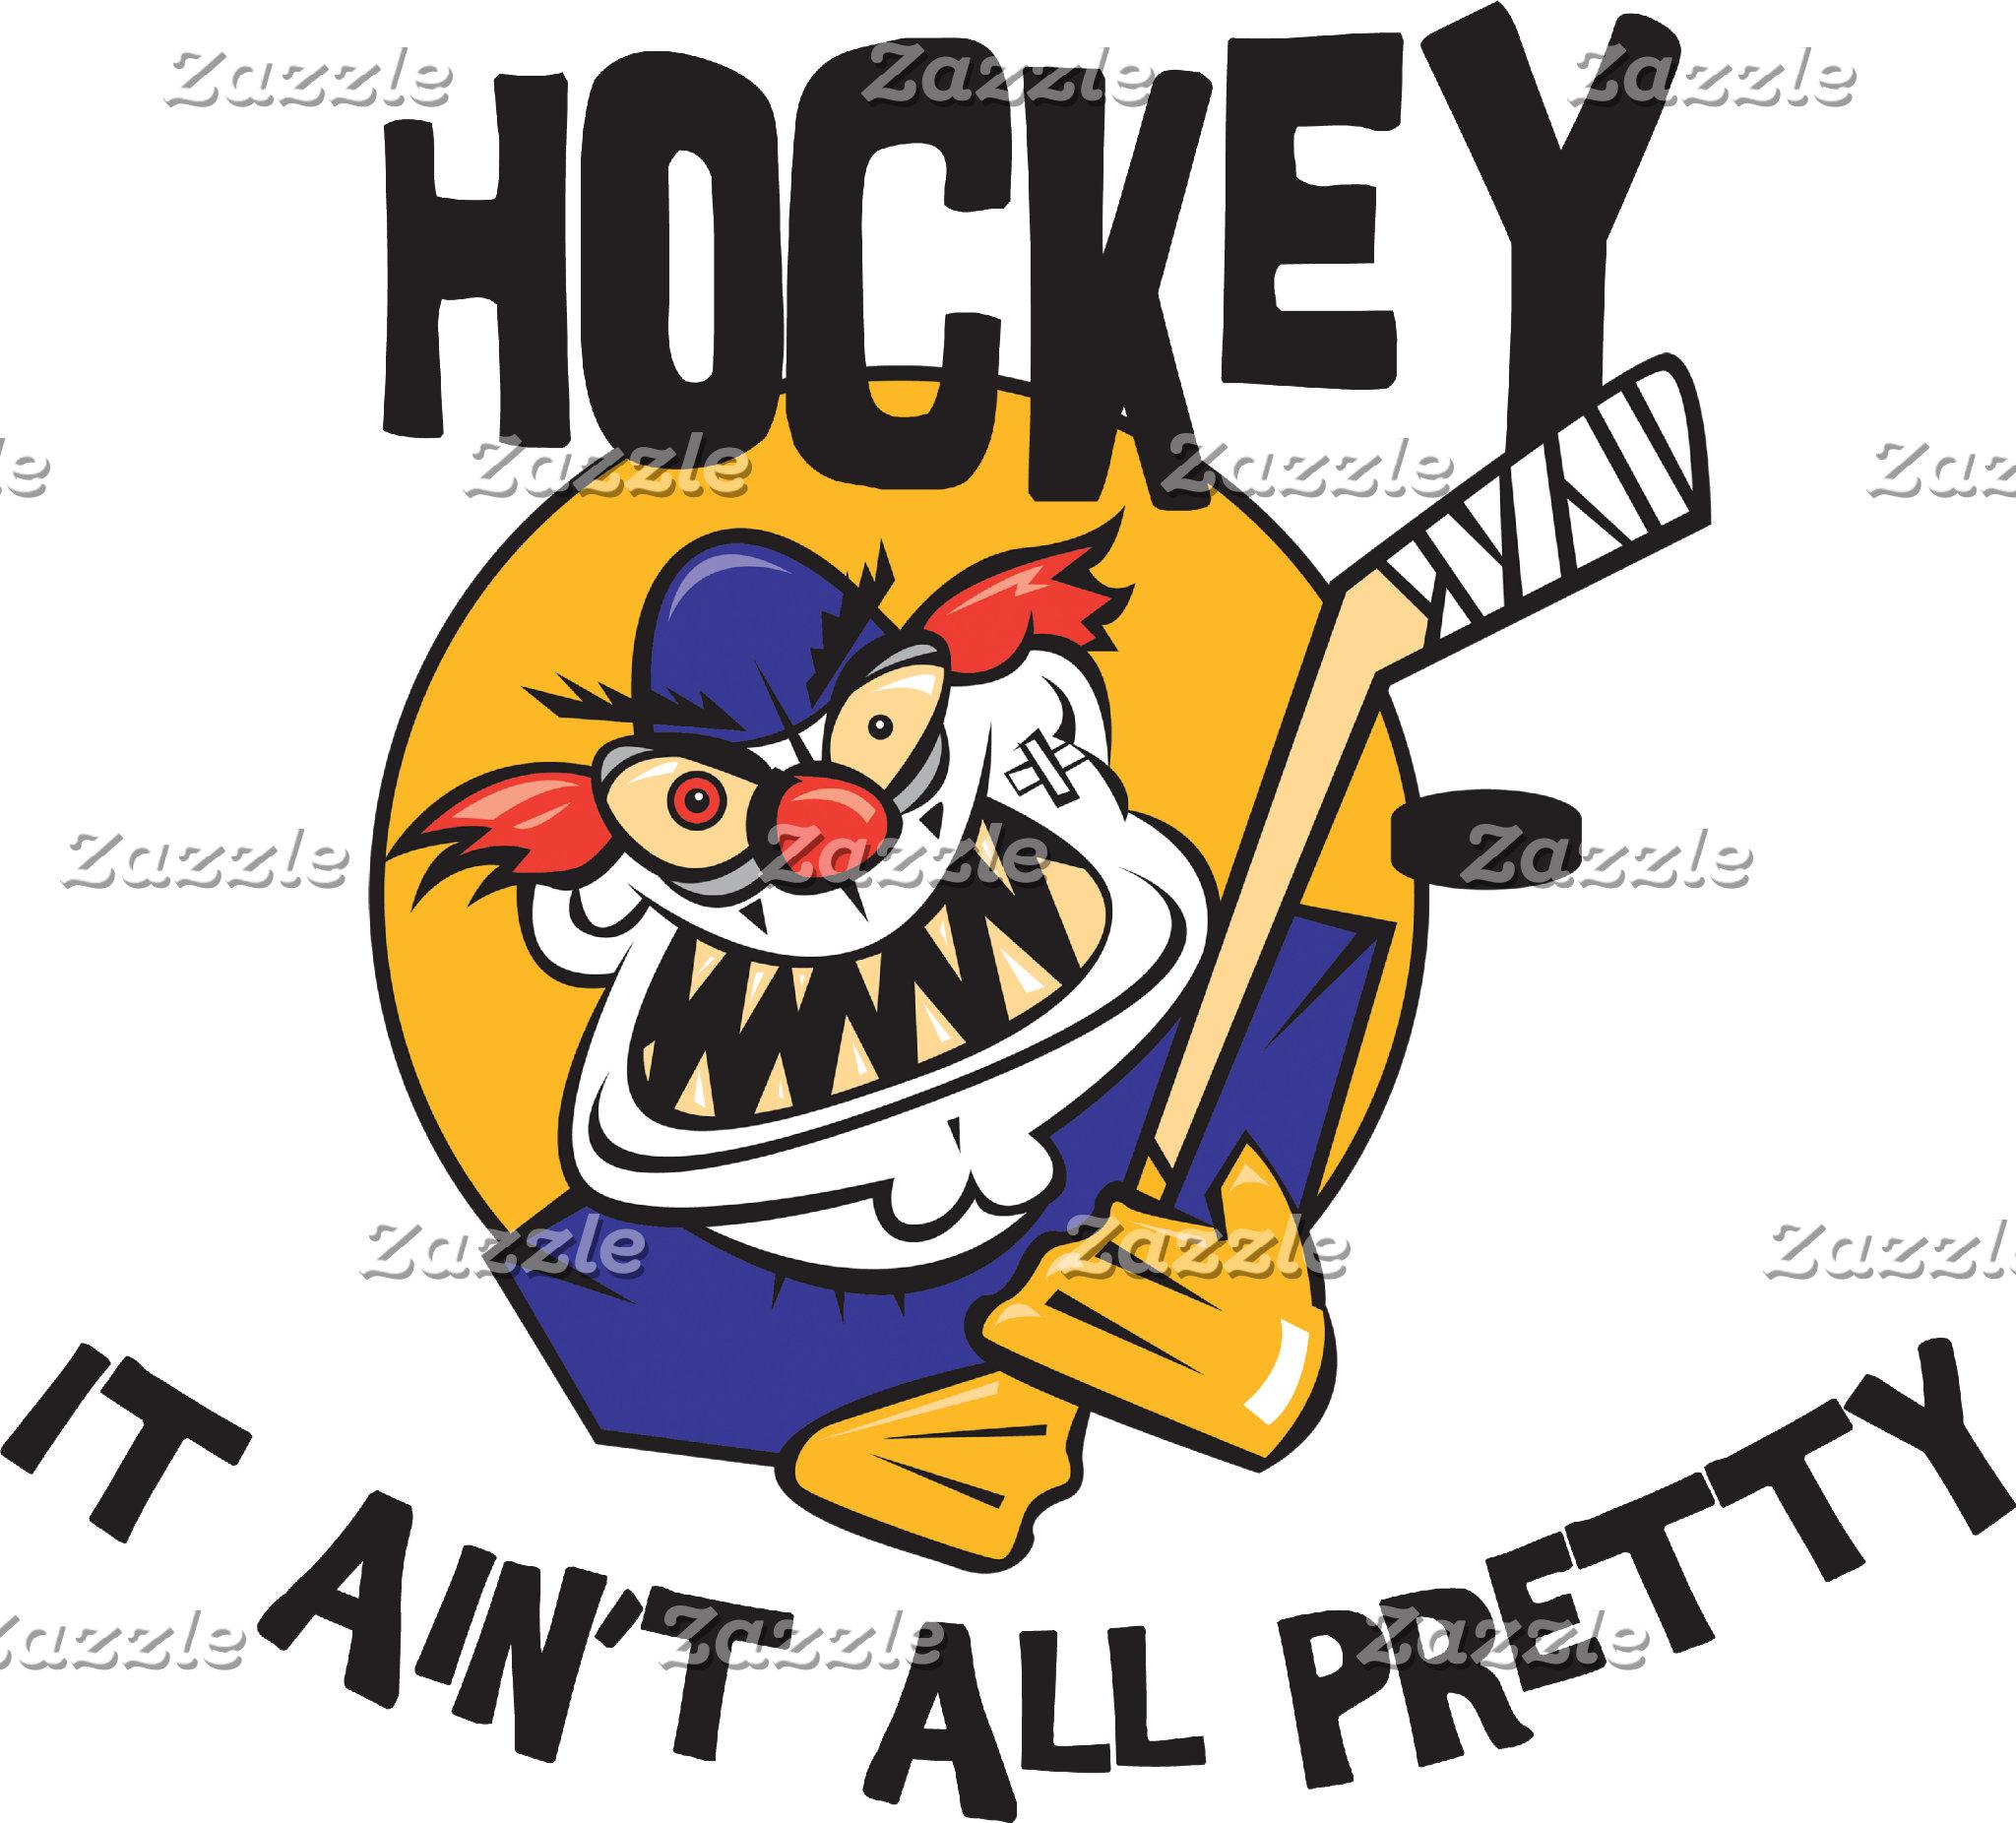 Funny Hockey It Ain't All Pretty T-Shirt